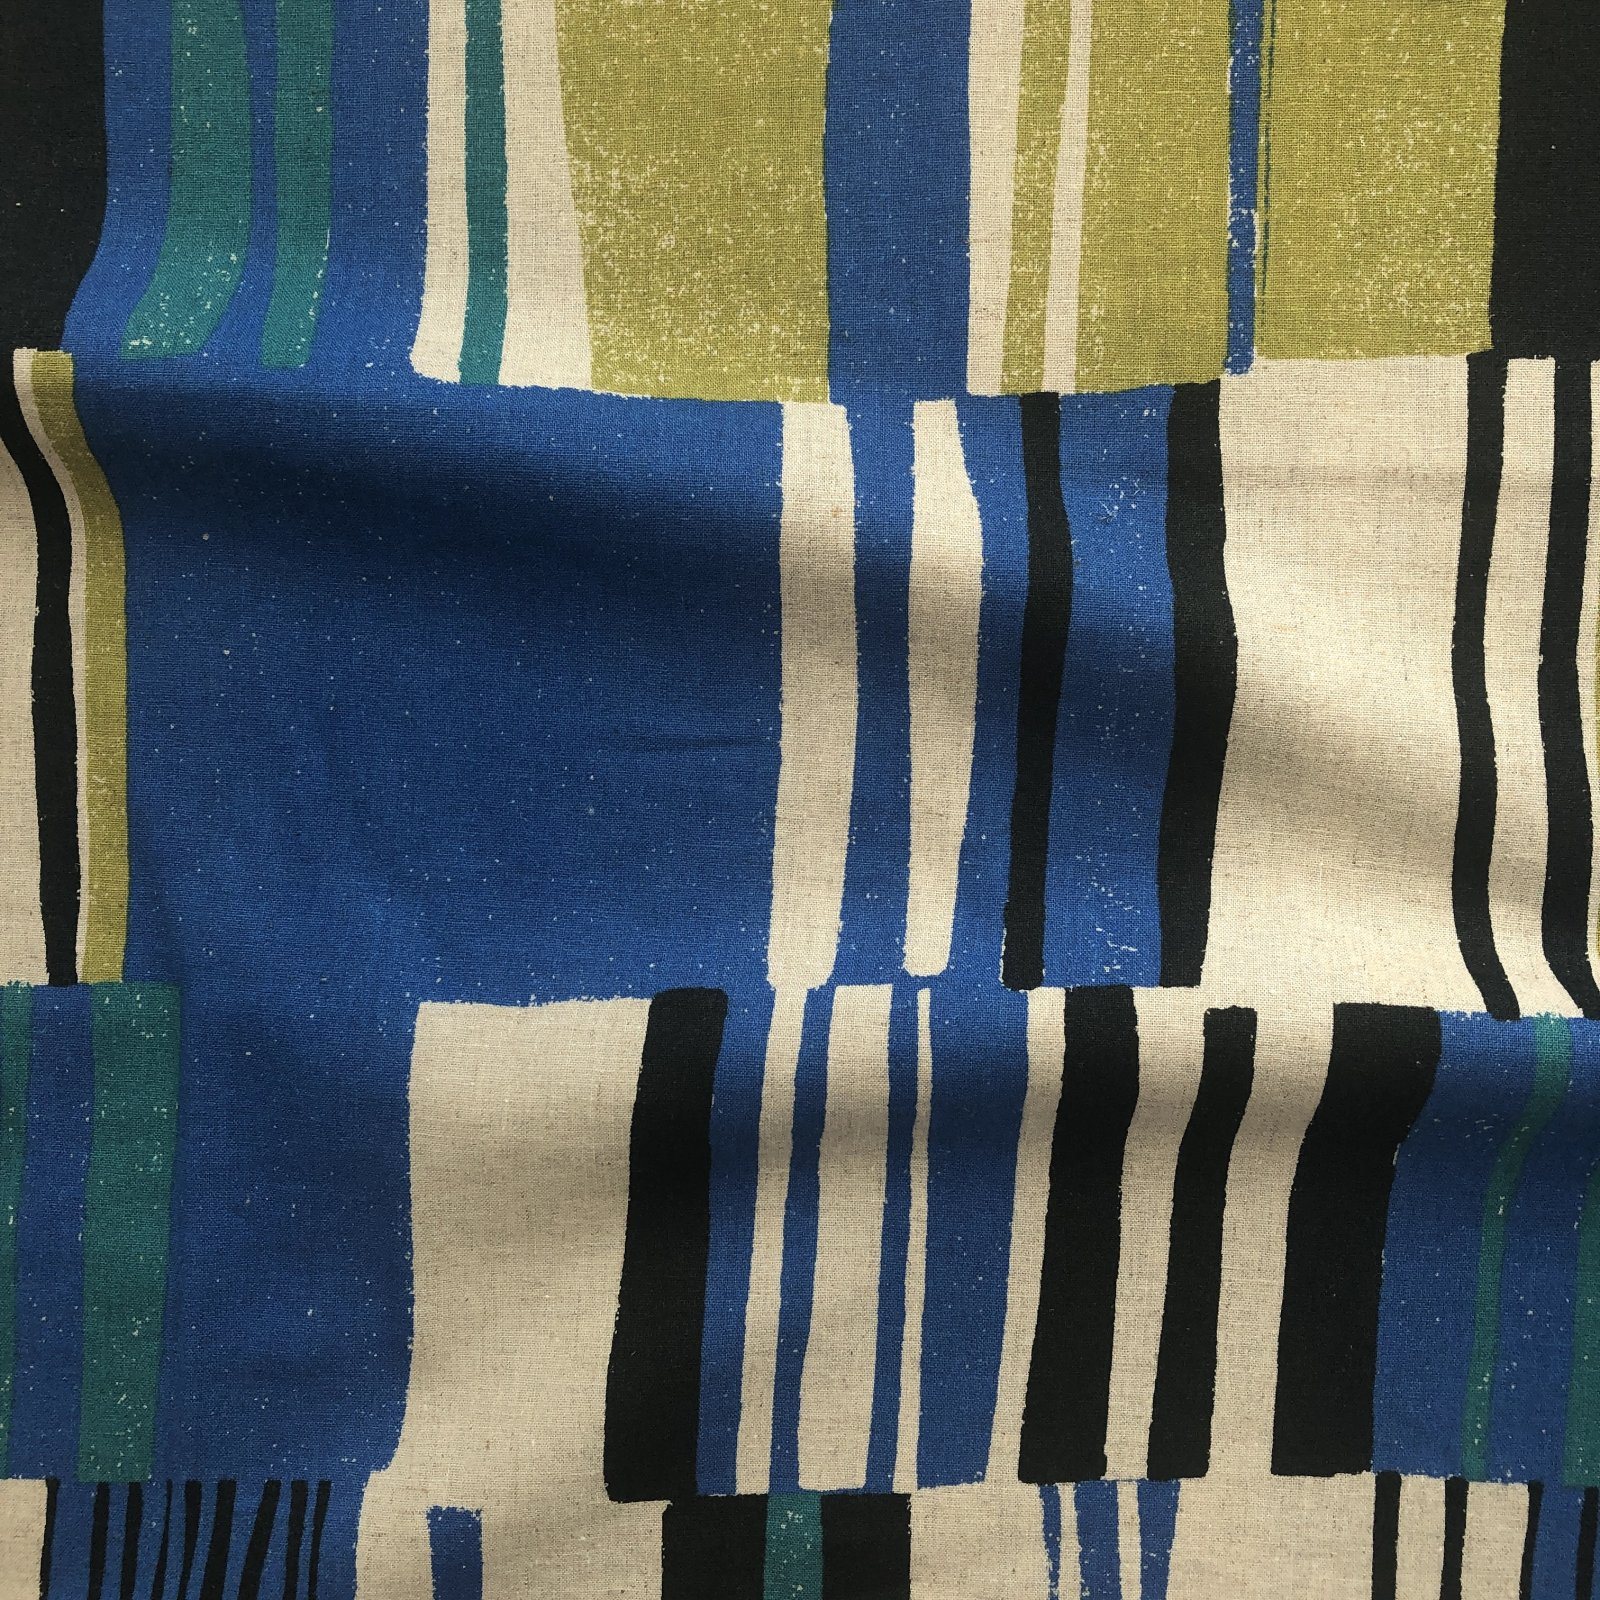 Hokkoh - Linen/Cotton - Boxy Stripes - Blue/Green